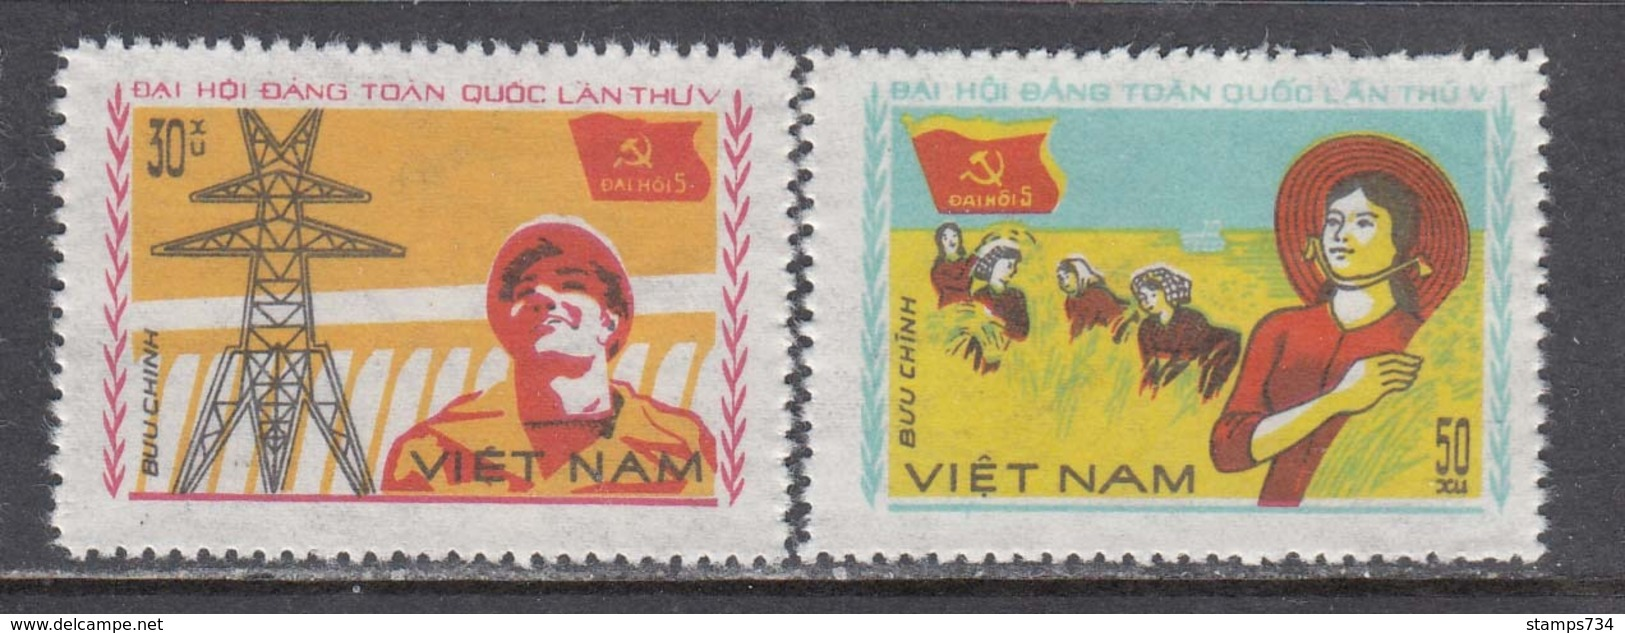 Vietnam 1982 - 5th Congress Of The Communist Party Of Vietnam, Mi-Nr. 1212/13, MNH** - Vietnam